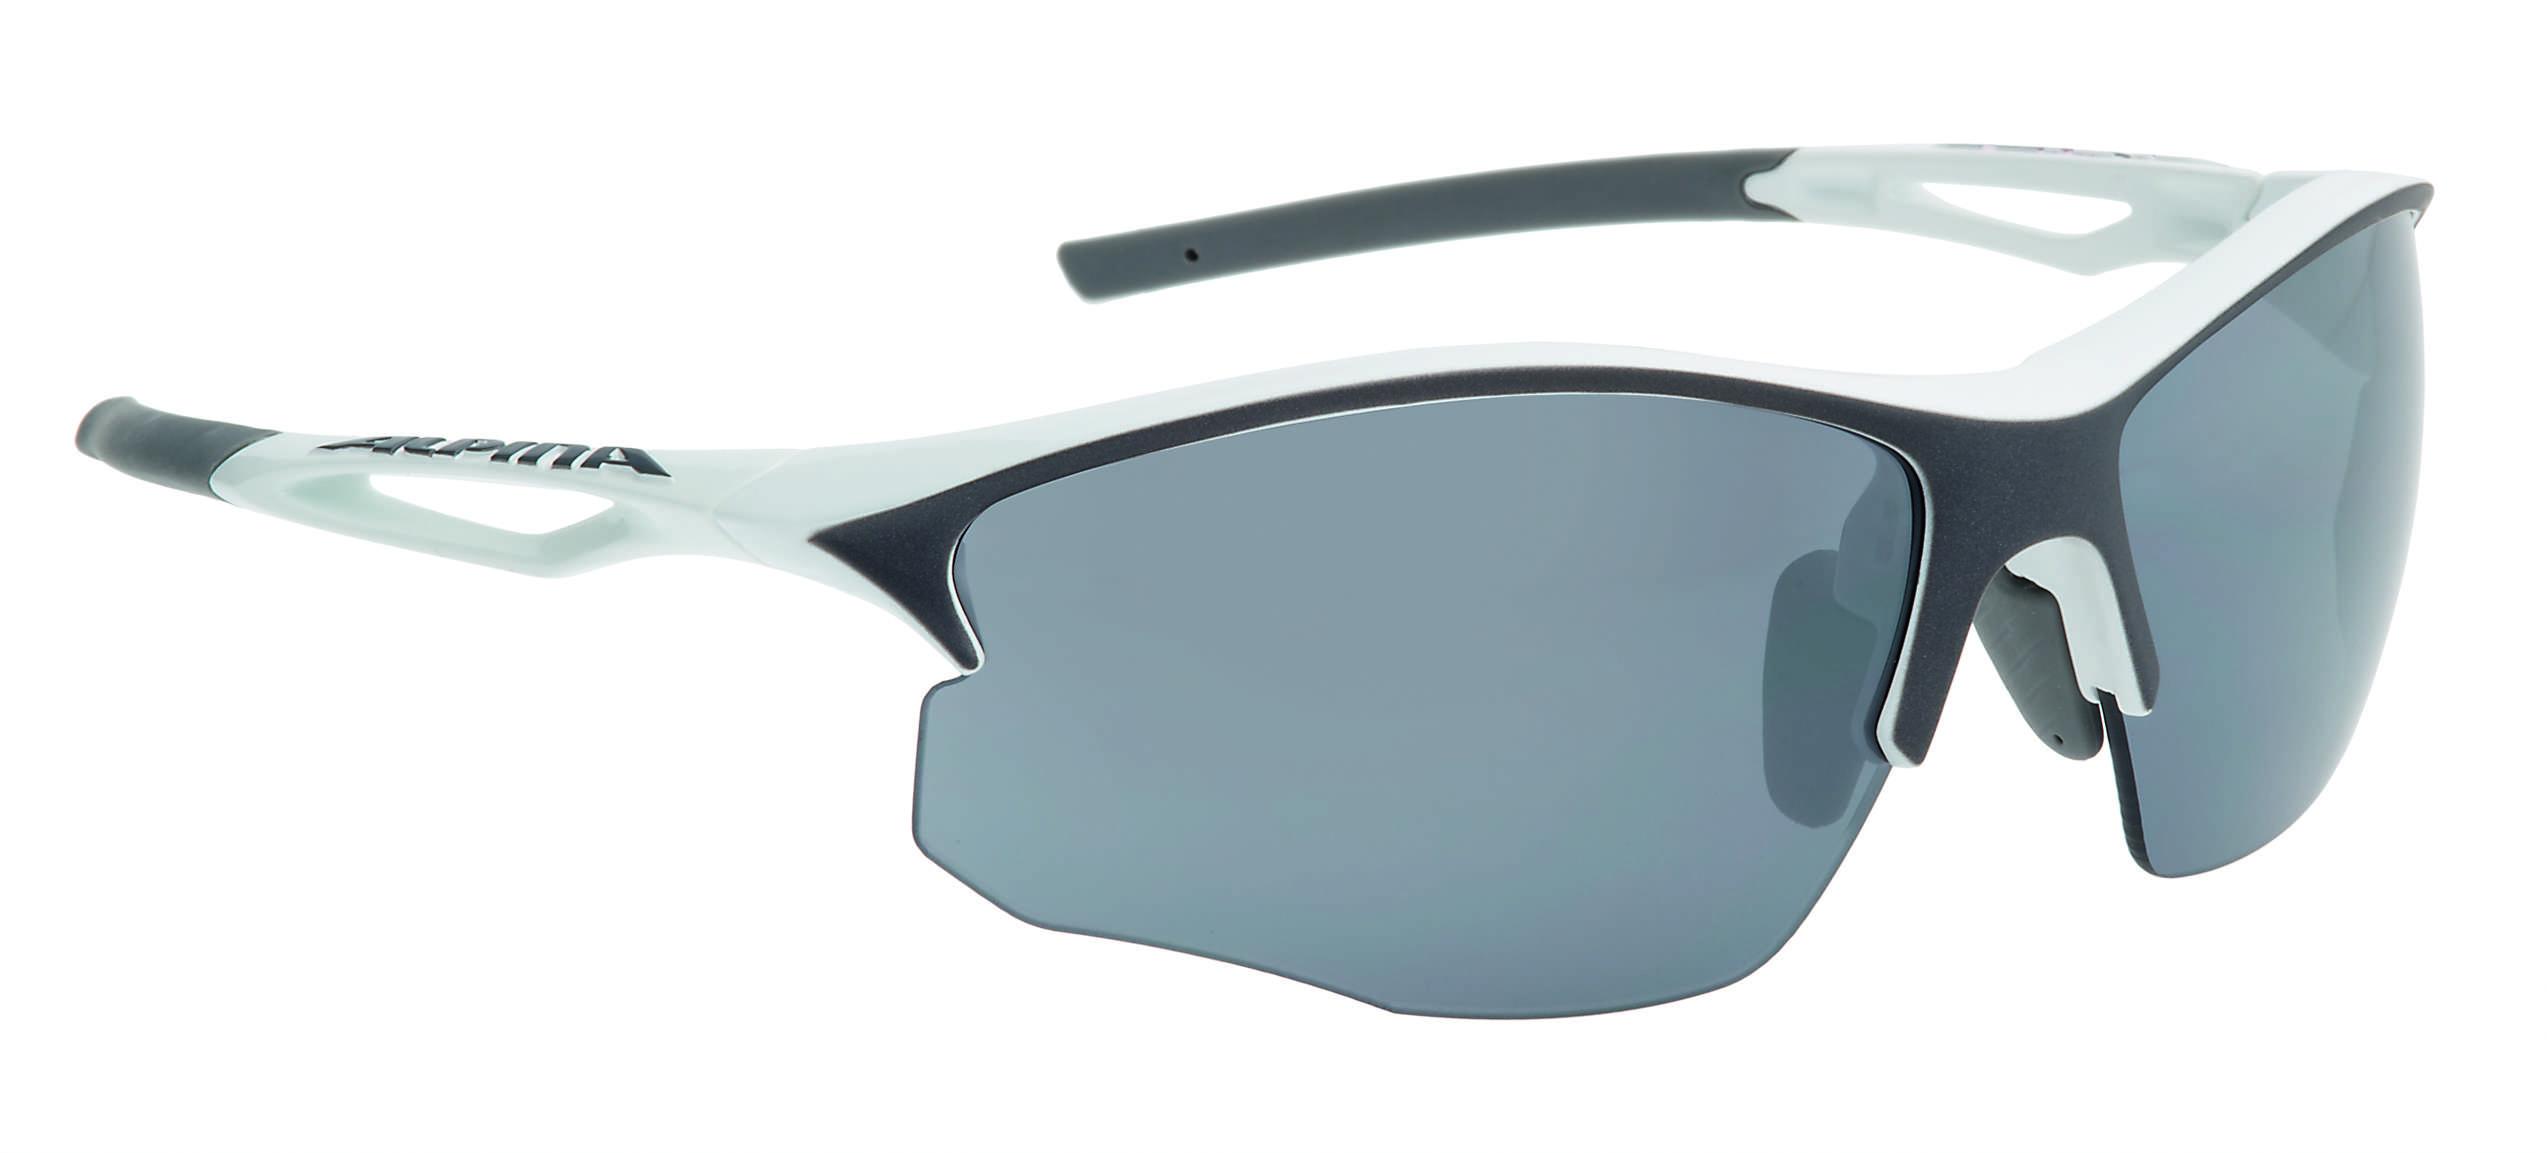 Очки солнцезащитные Alpina PERFORMANCE SORCERY HR CM+ white-antracite matt, солнцезащитные, 1180491  - купить со скидкой